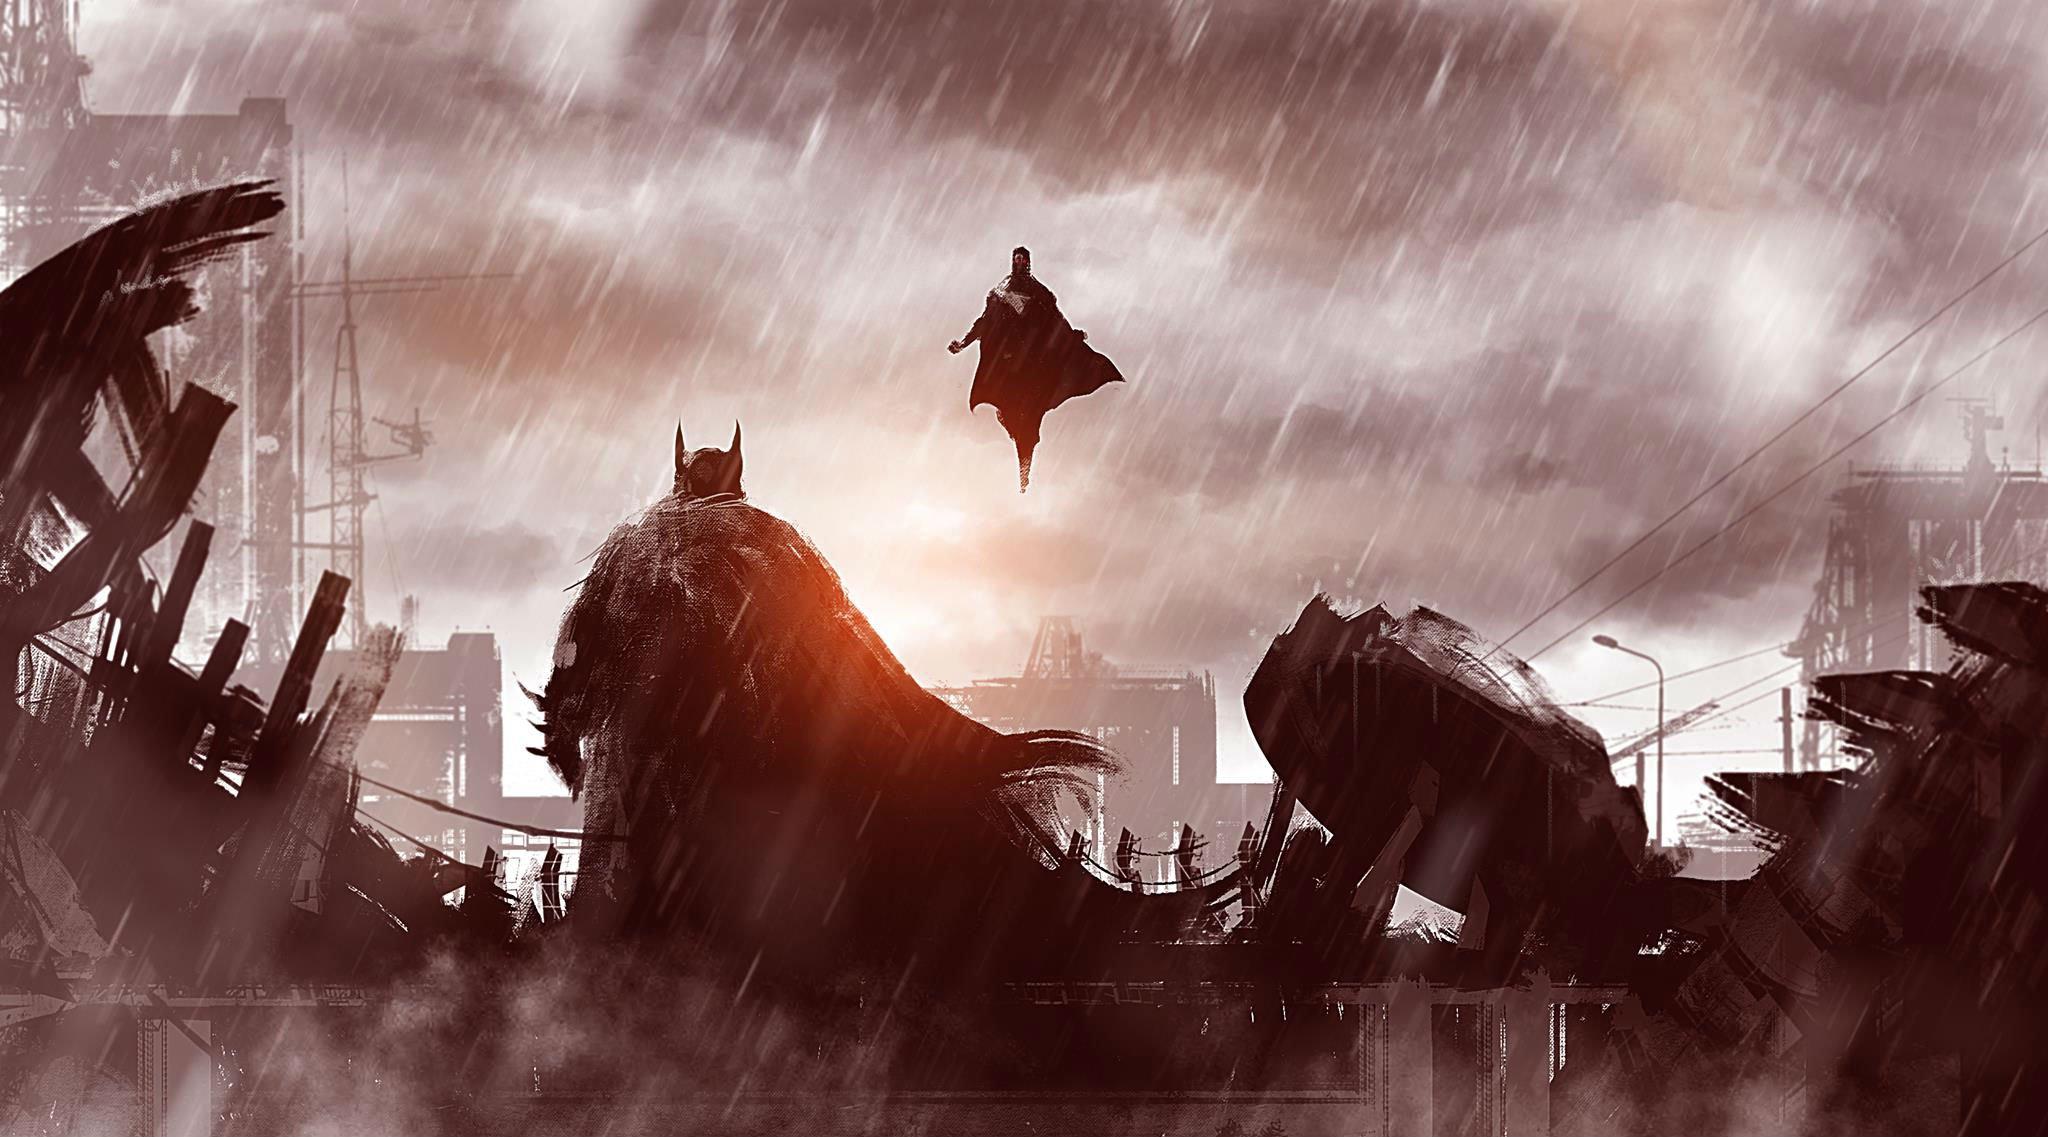 2048x1137px batman vs superman movie wallpapers - wallpapersafari